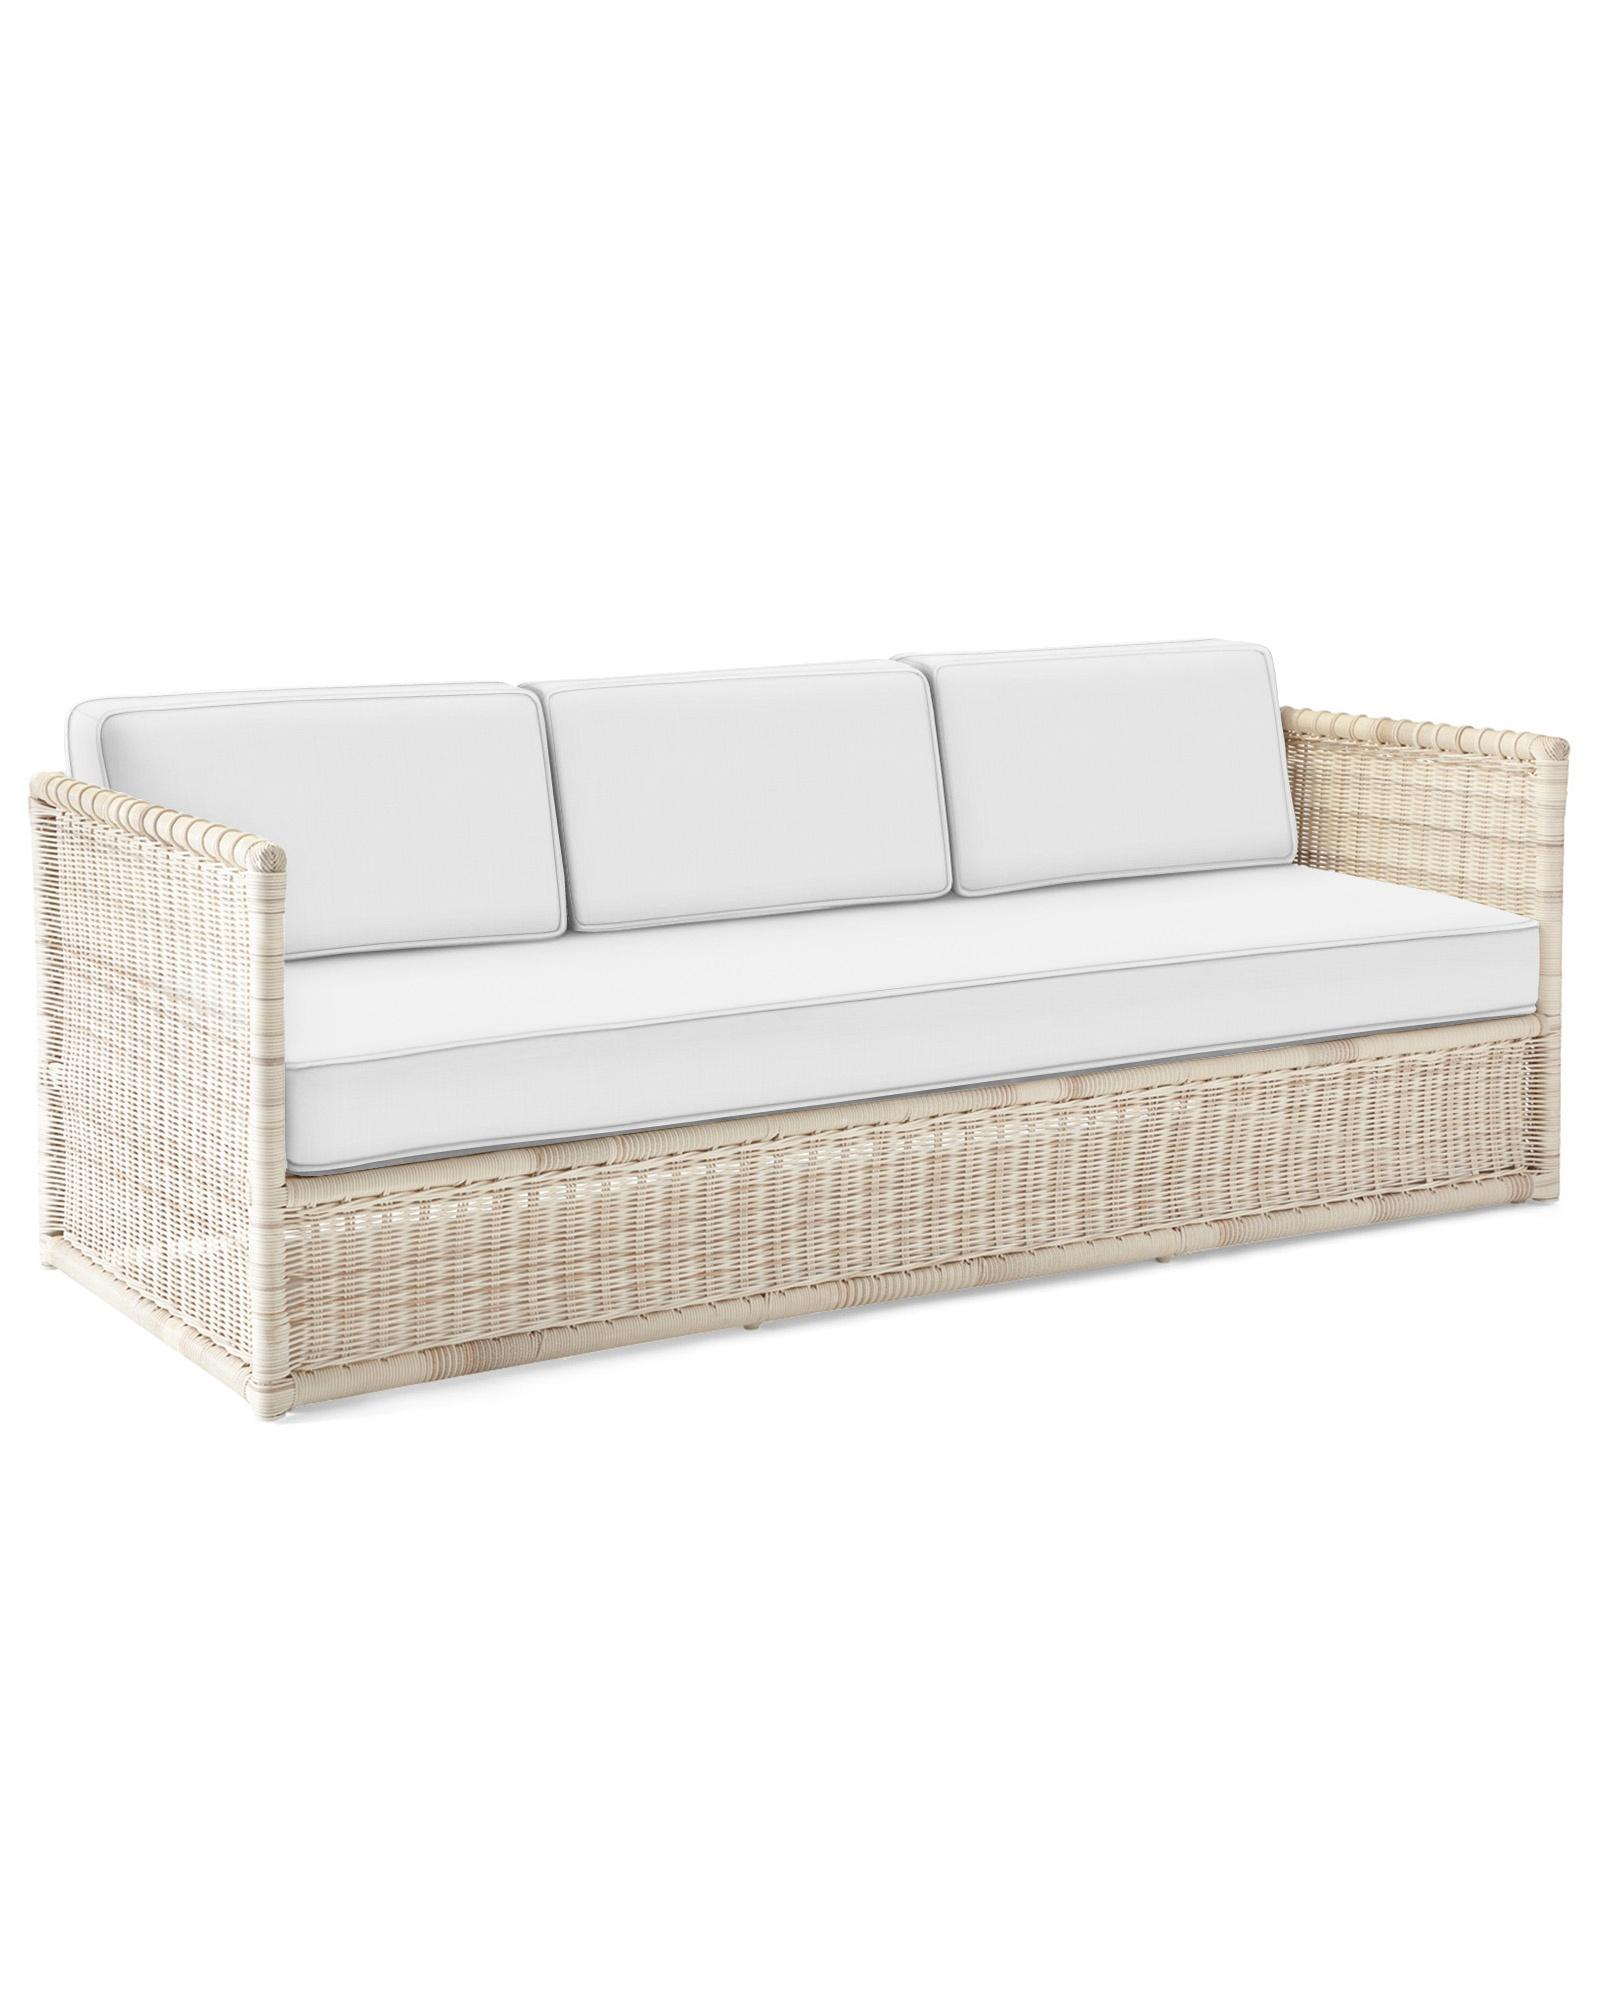 Pacifica Sofa - Driftwood